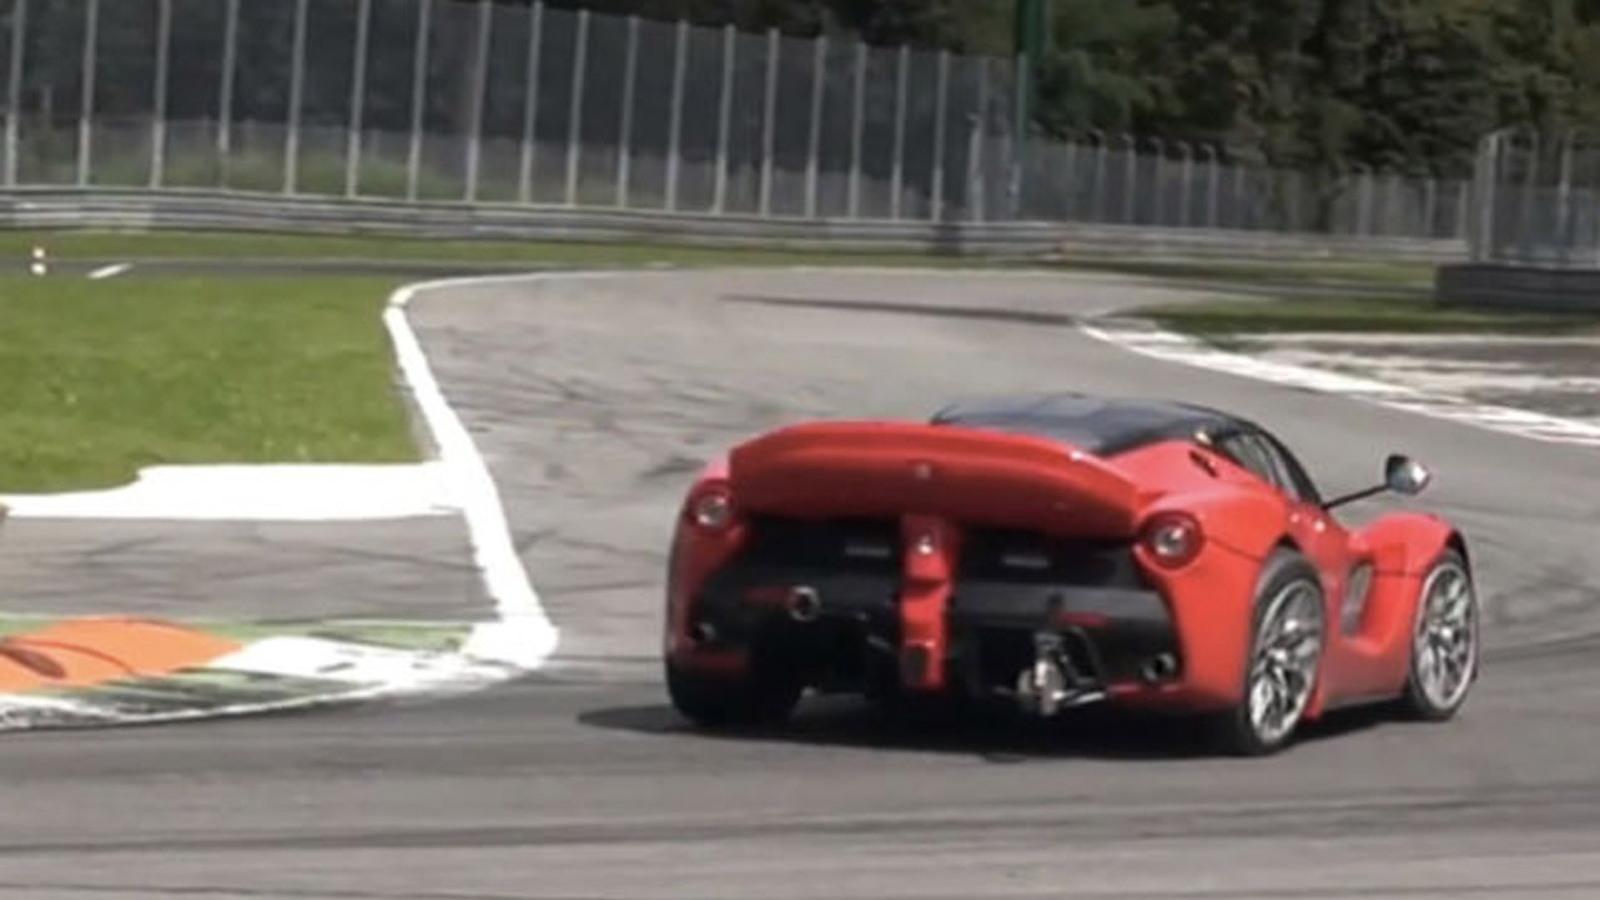 Ferrari LaFerrari XX prototype with right rear wheel out of alignment